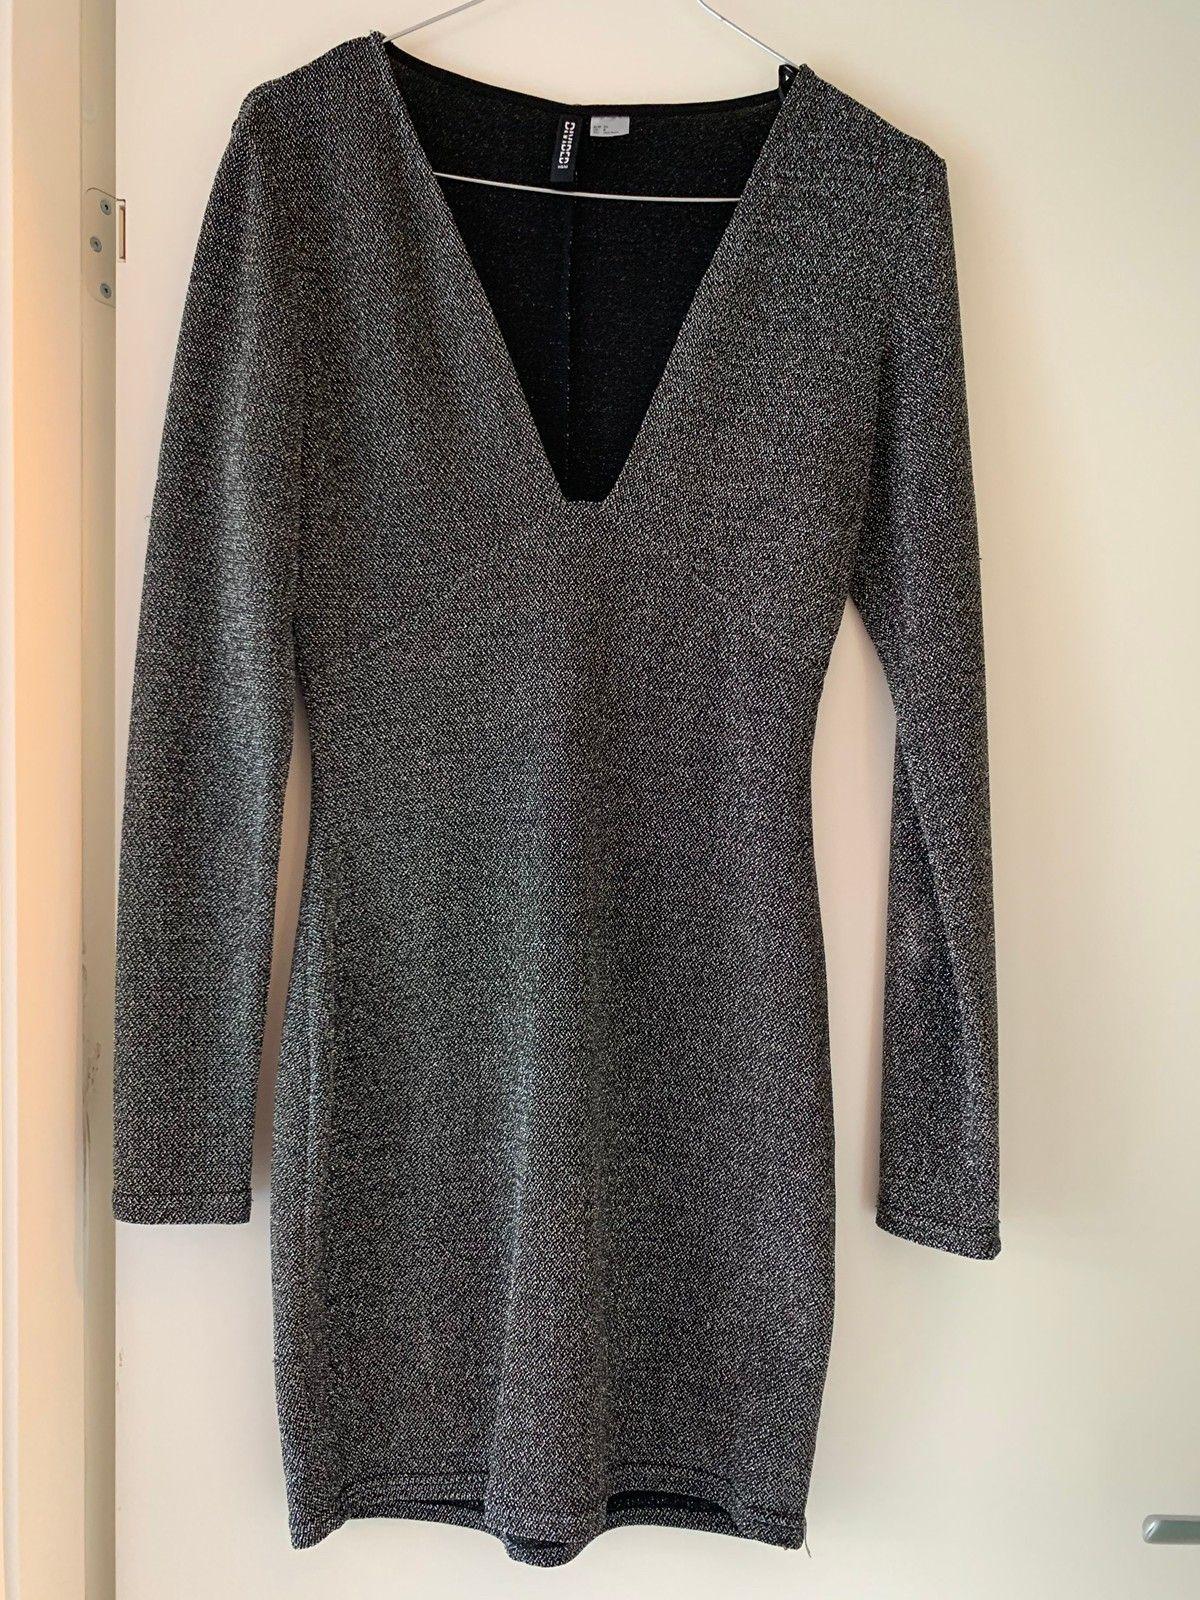 Divided kjole | FINN.no